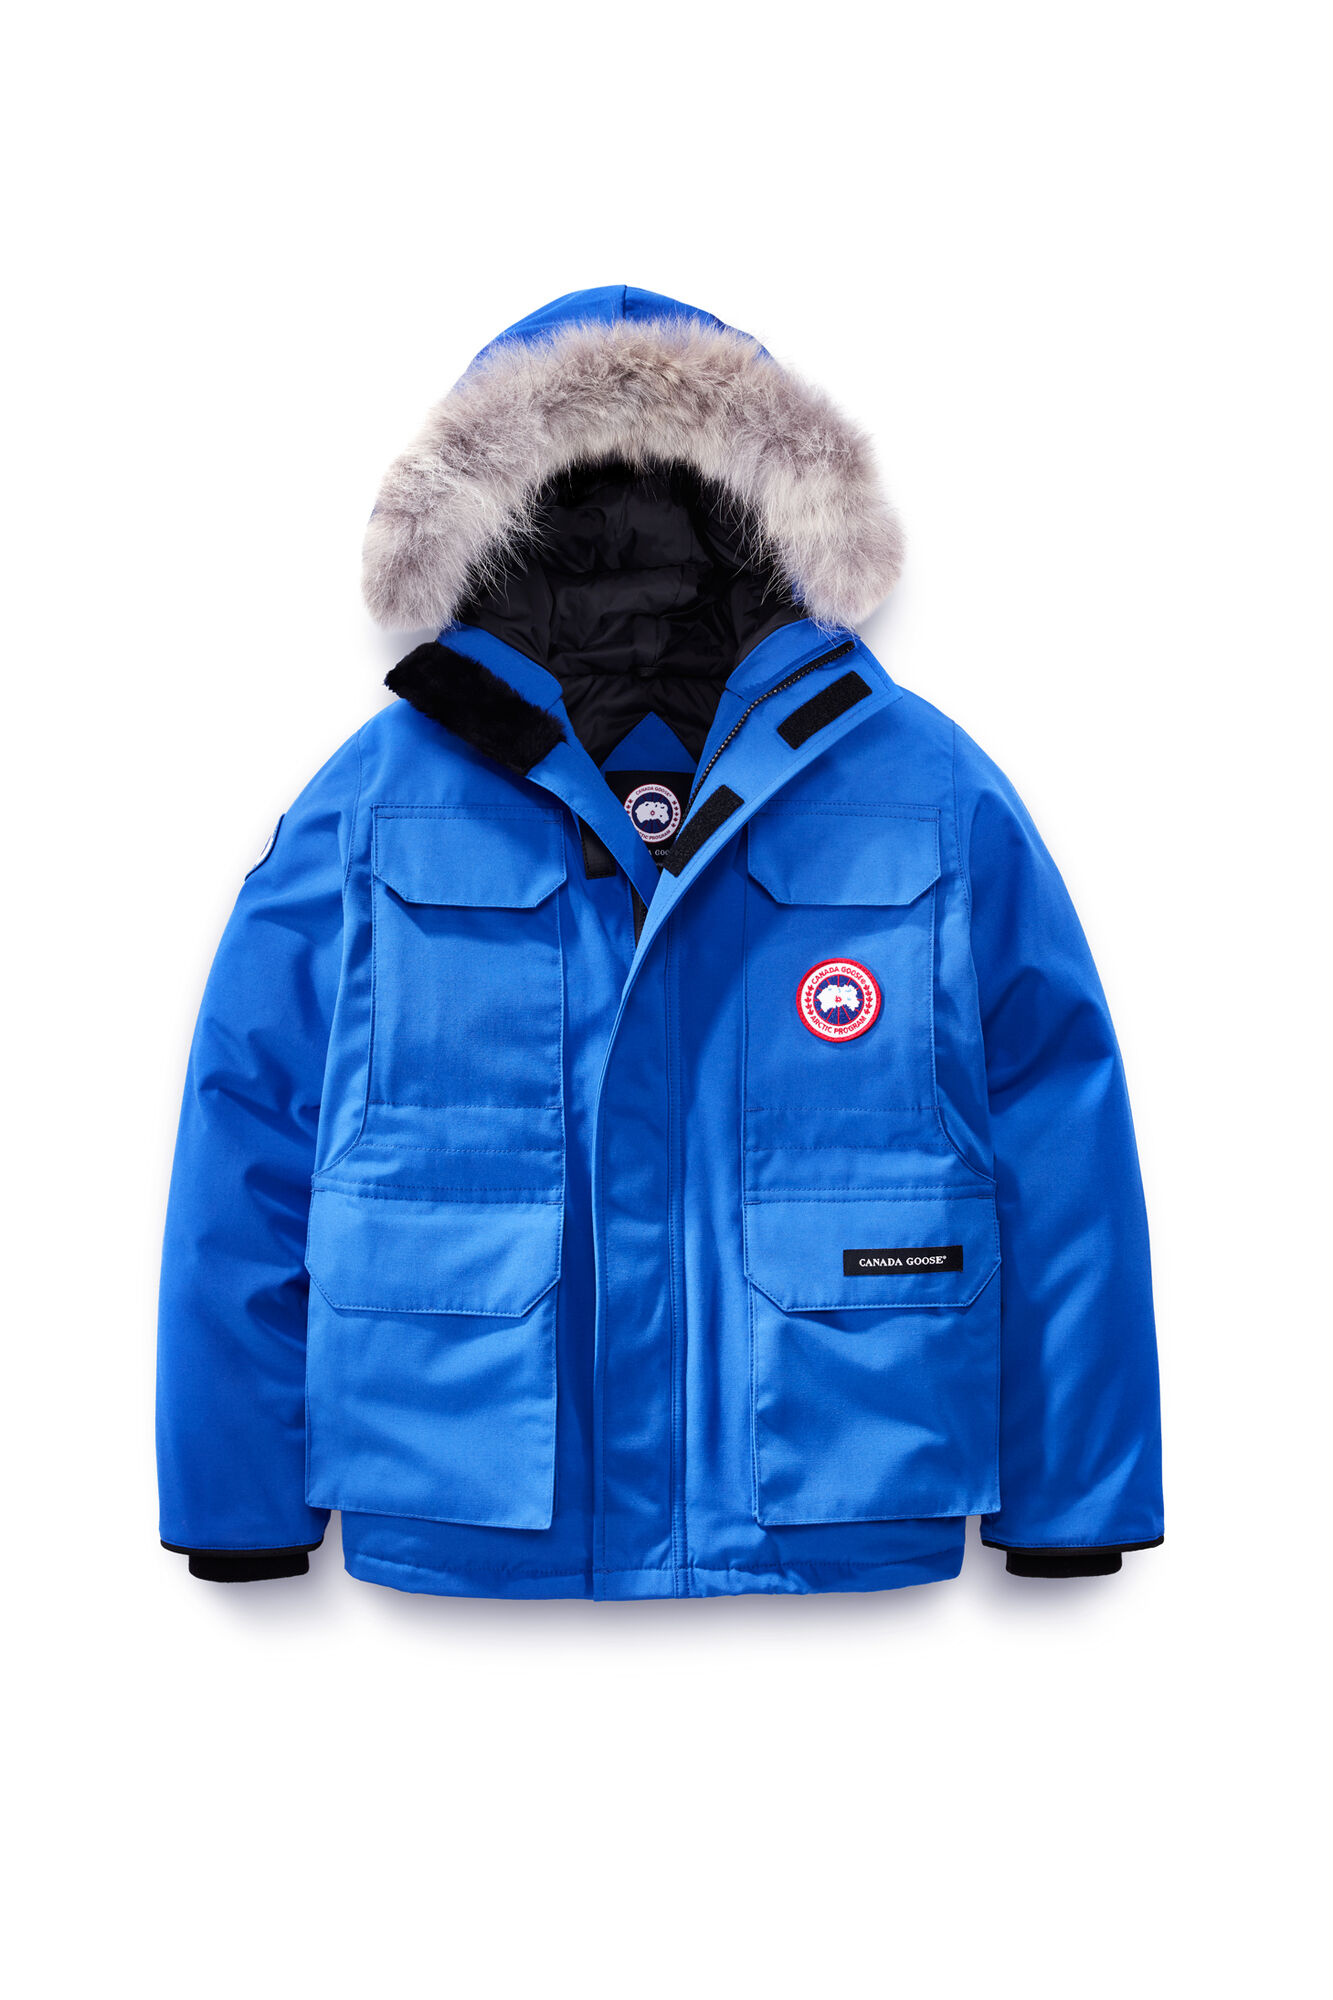 Kids Canada Goose Jacket